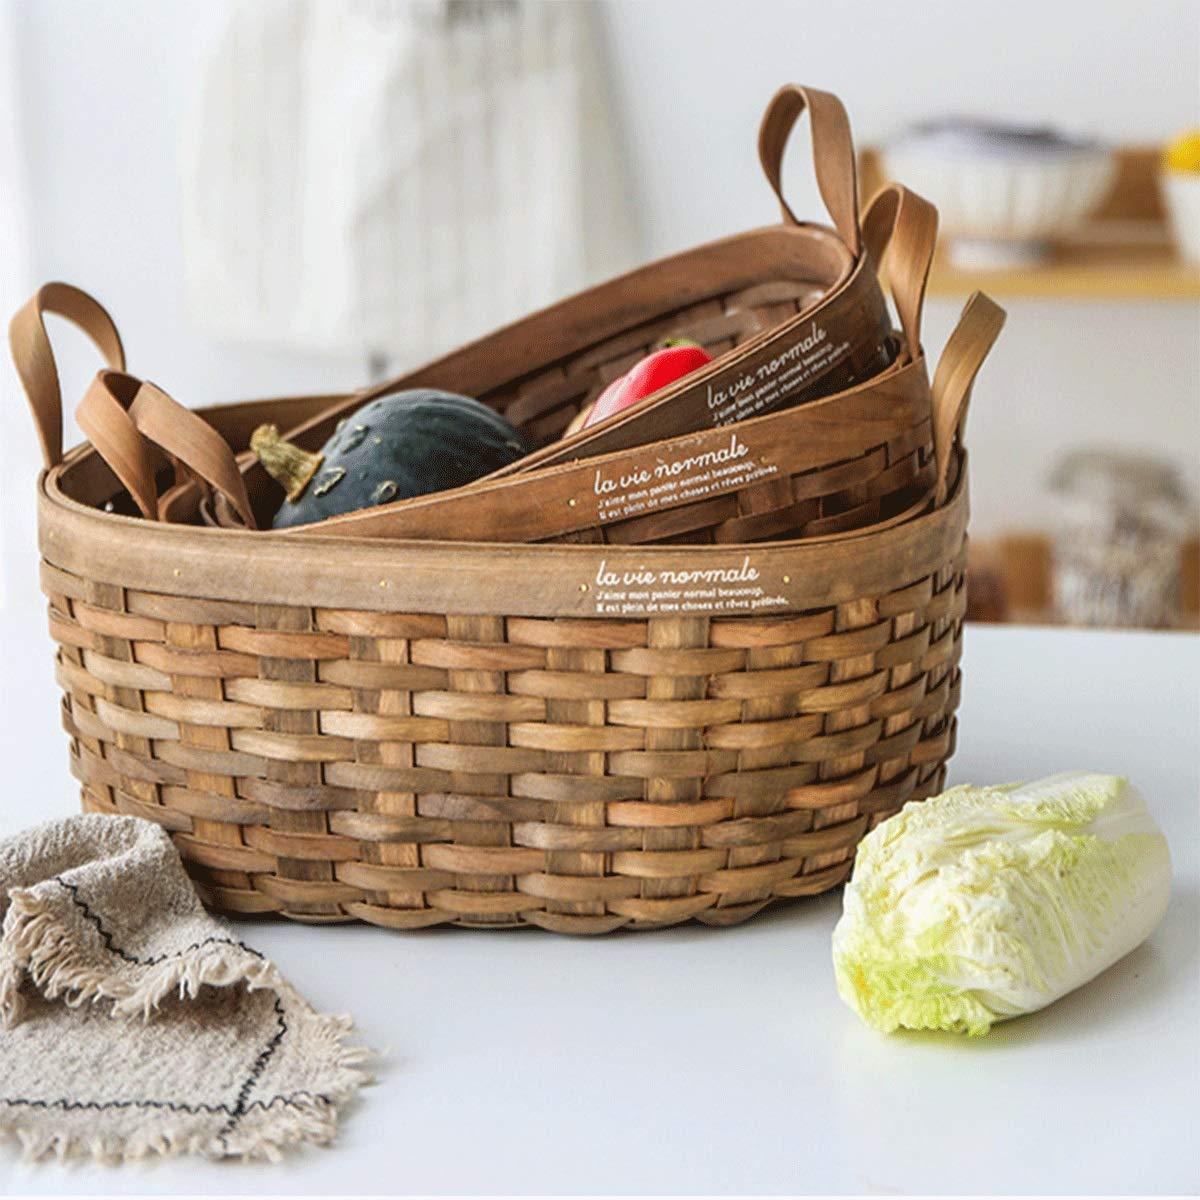 Tongboshi Bread Basket, Hand-Woven Storage Basket (with Handle), Picnic Fruit Bread Basket, Storage Basket, Oval Fruit Basket Three-Piece, Latest Models (Color : 3-Piece Set) by Tongboshi (Image #4)